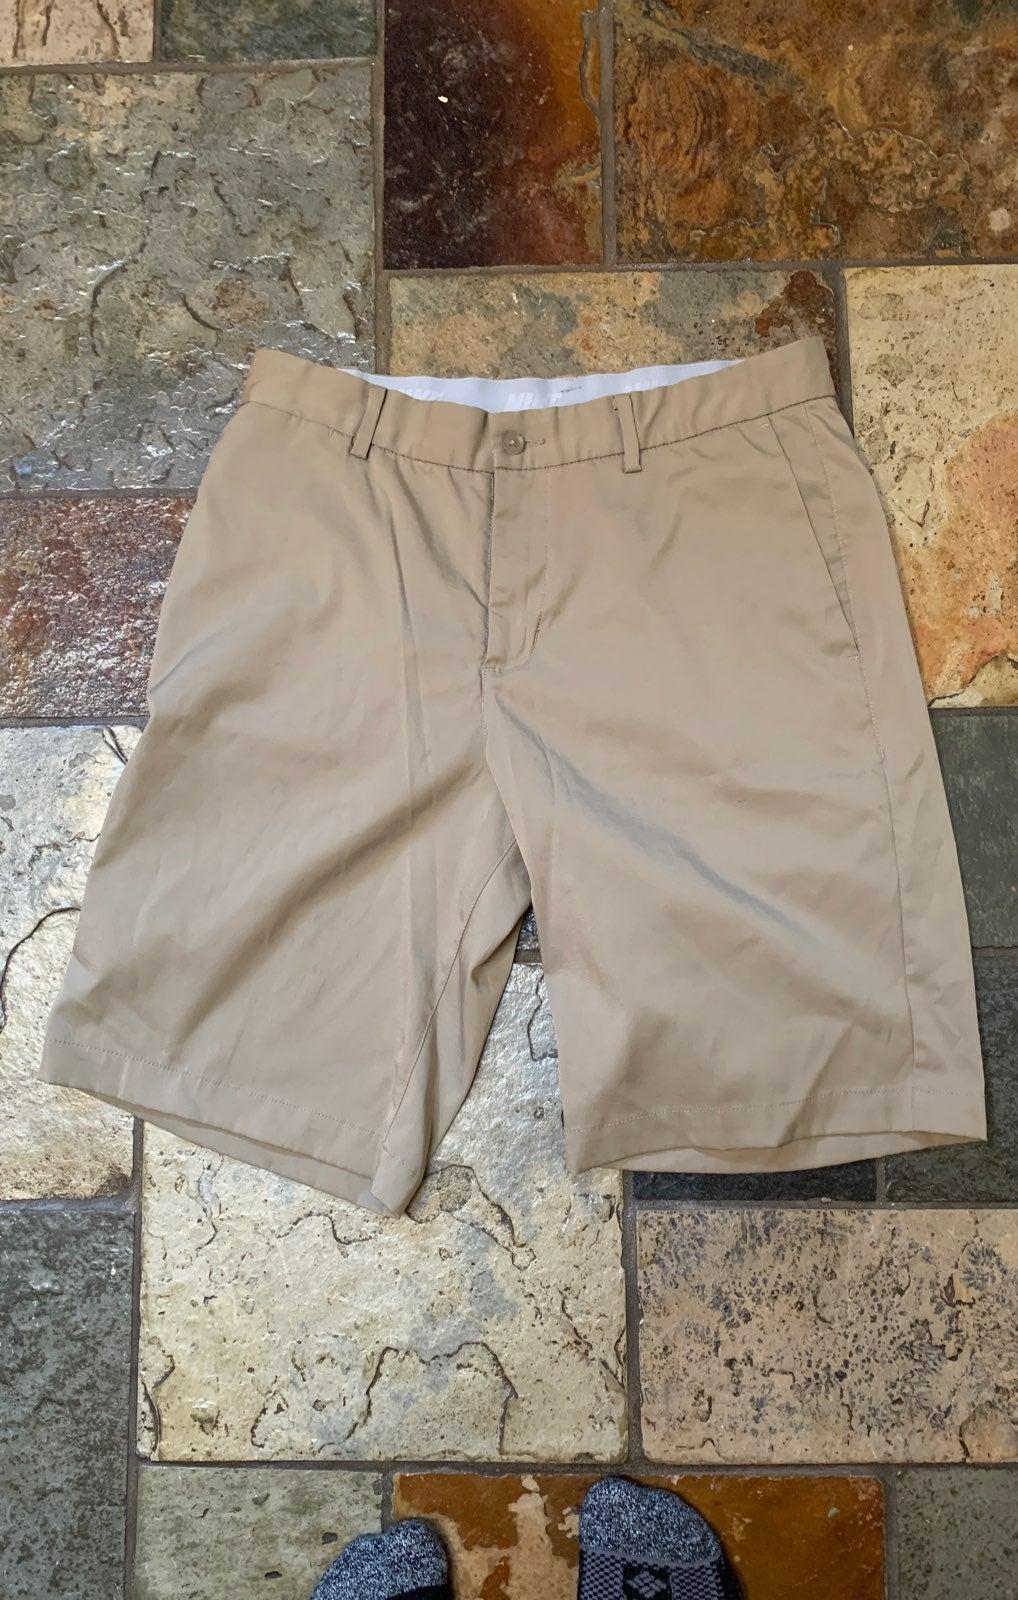 Nike Dri-Fit Golf Shorts - Size waist: 3